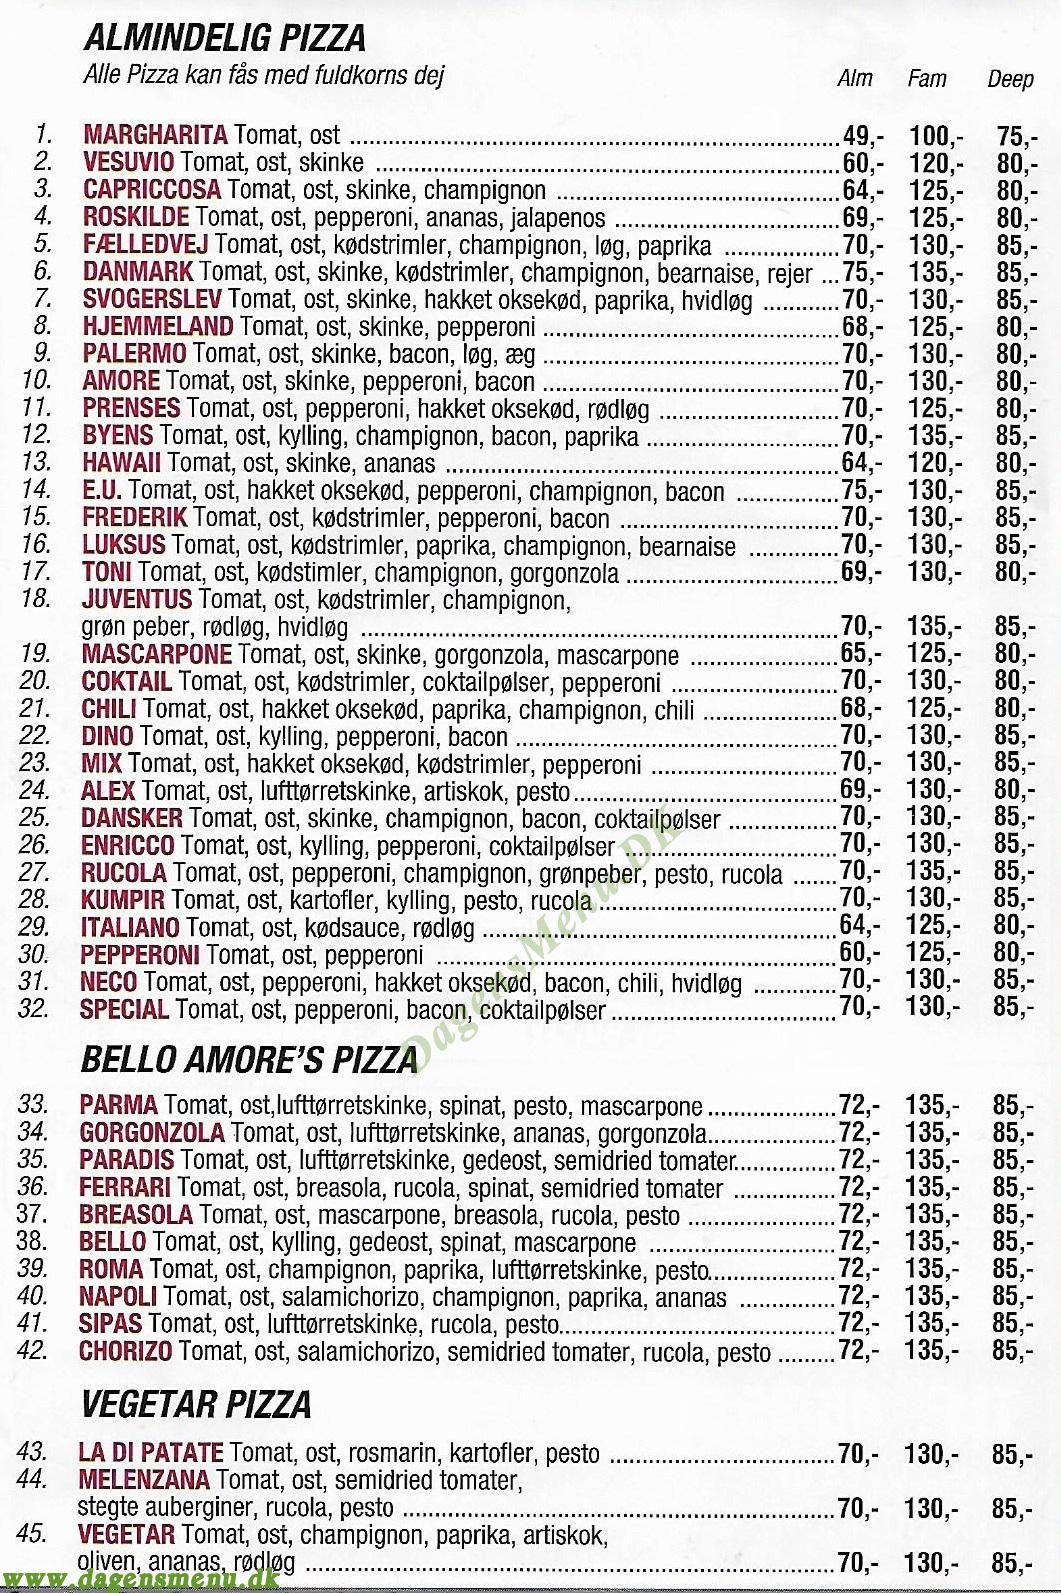 Bello Amore Pizza House - Menukort